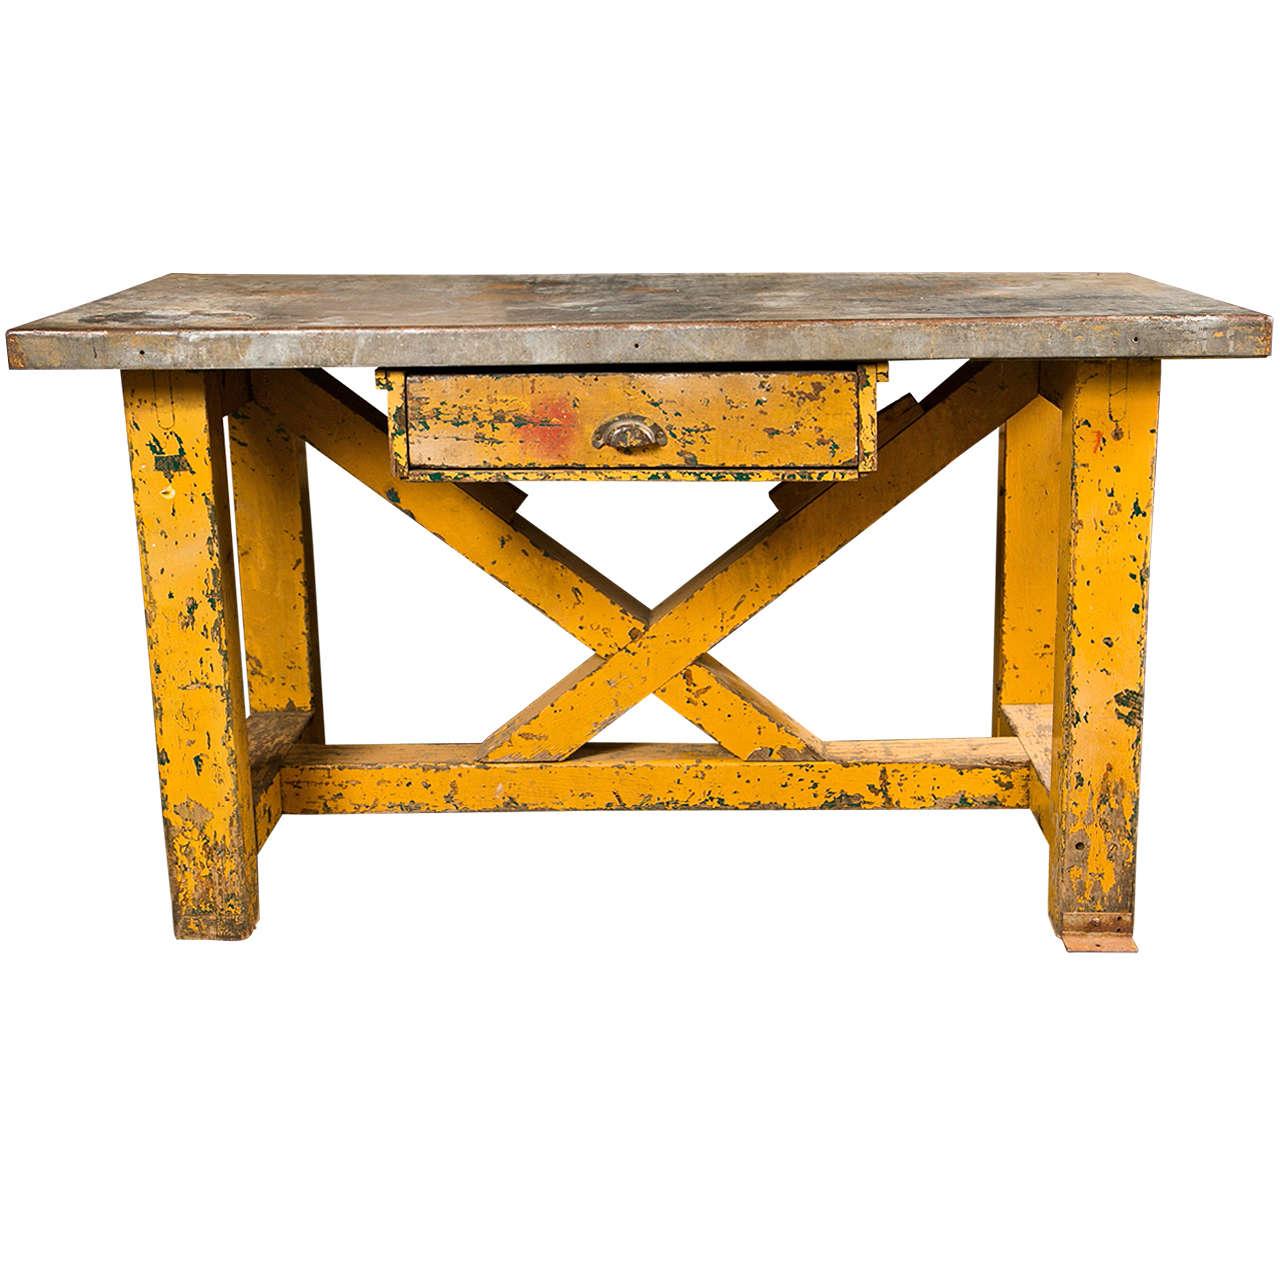 vintage american zinc top factory work table c 1920 40 at 1stdibs. Black Bedroom Furniture Sets. Home Design Ideas